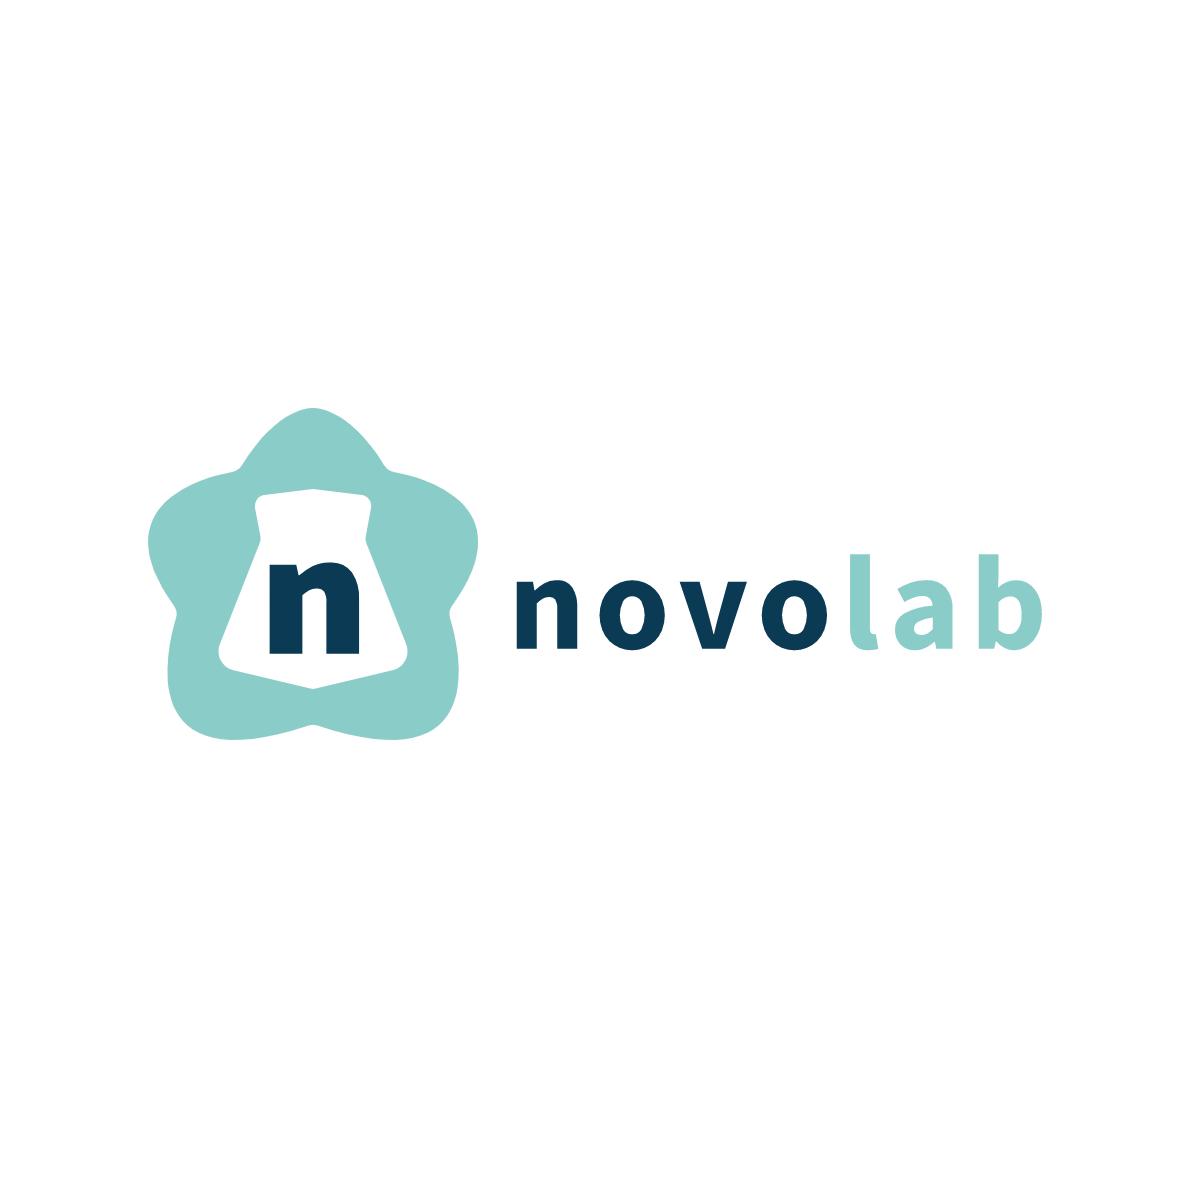 Novasina - LabMaster Neo Aw meter + awSens-ELS